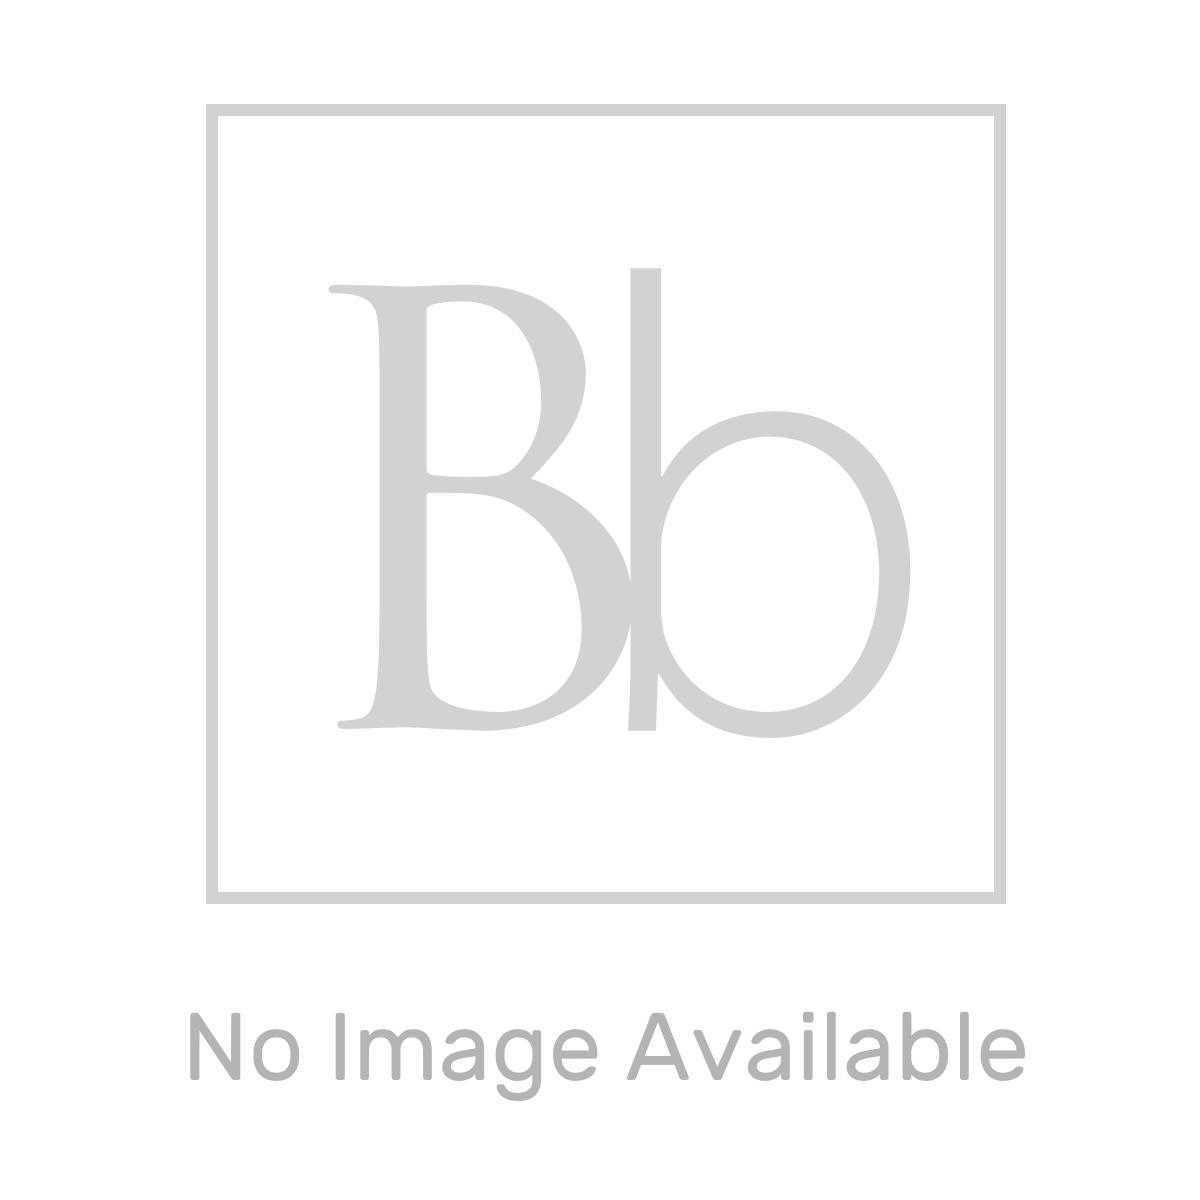 Burlington Classic Grey Freestanding Right Hand Curved Corner Vanity Unit 1340mm